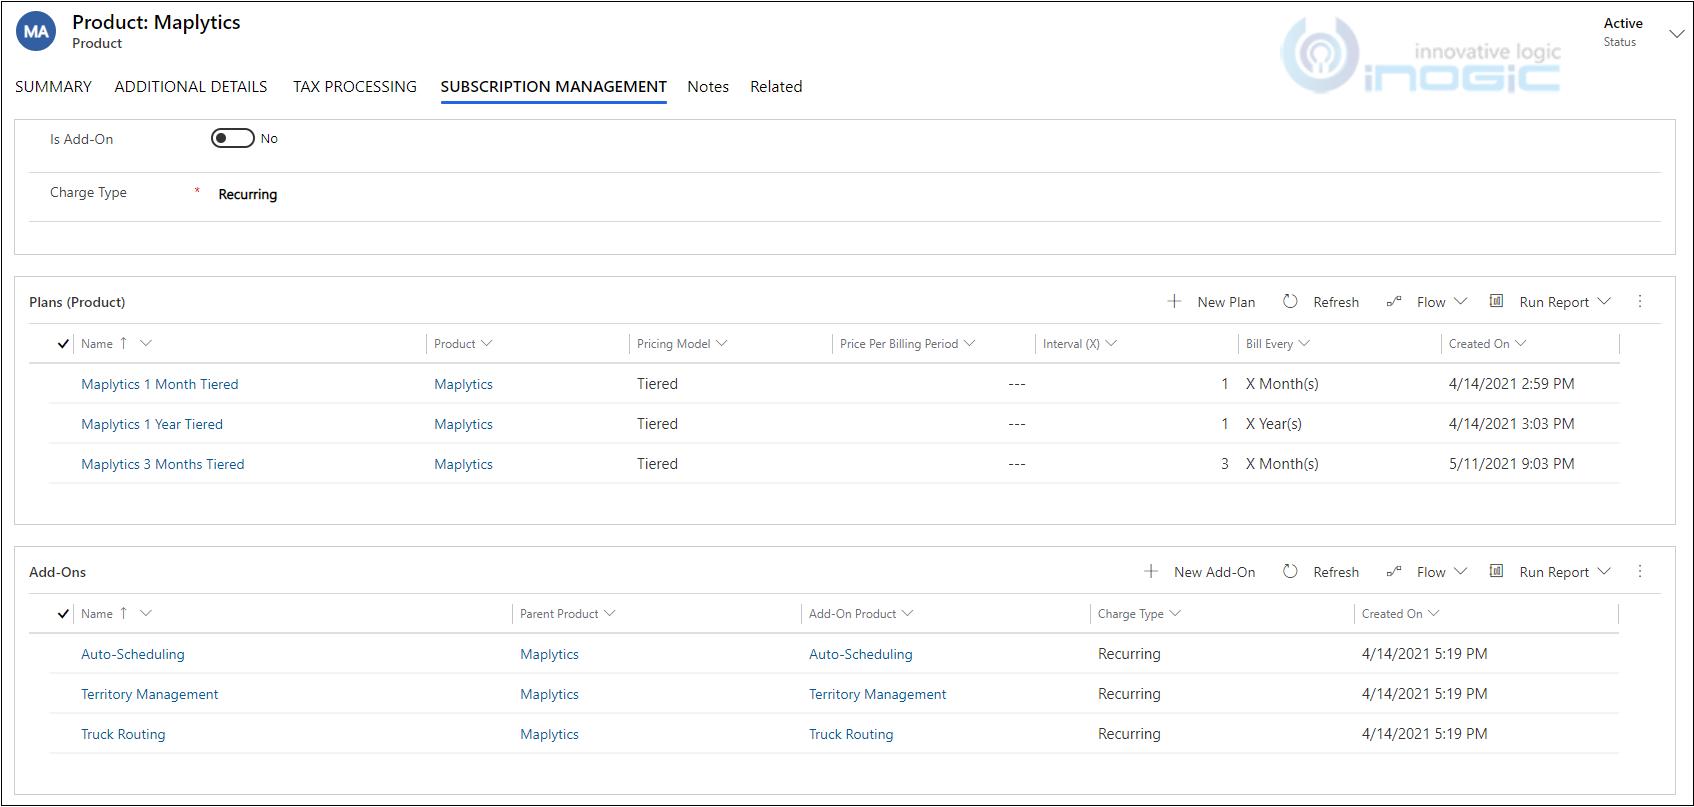 New Subscription Management App